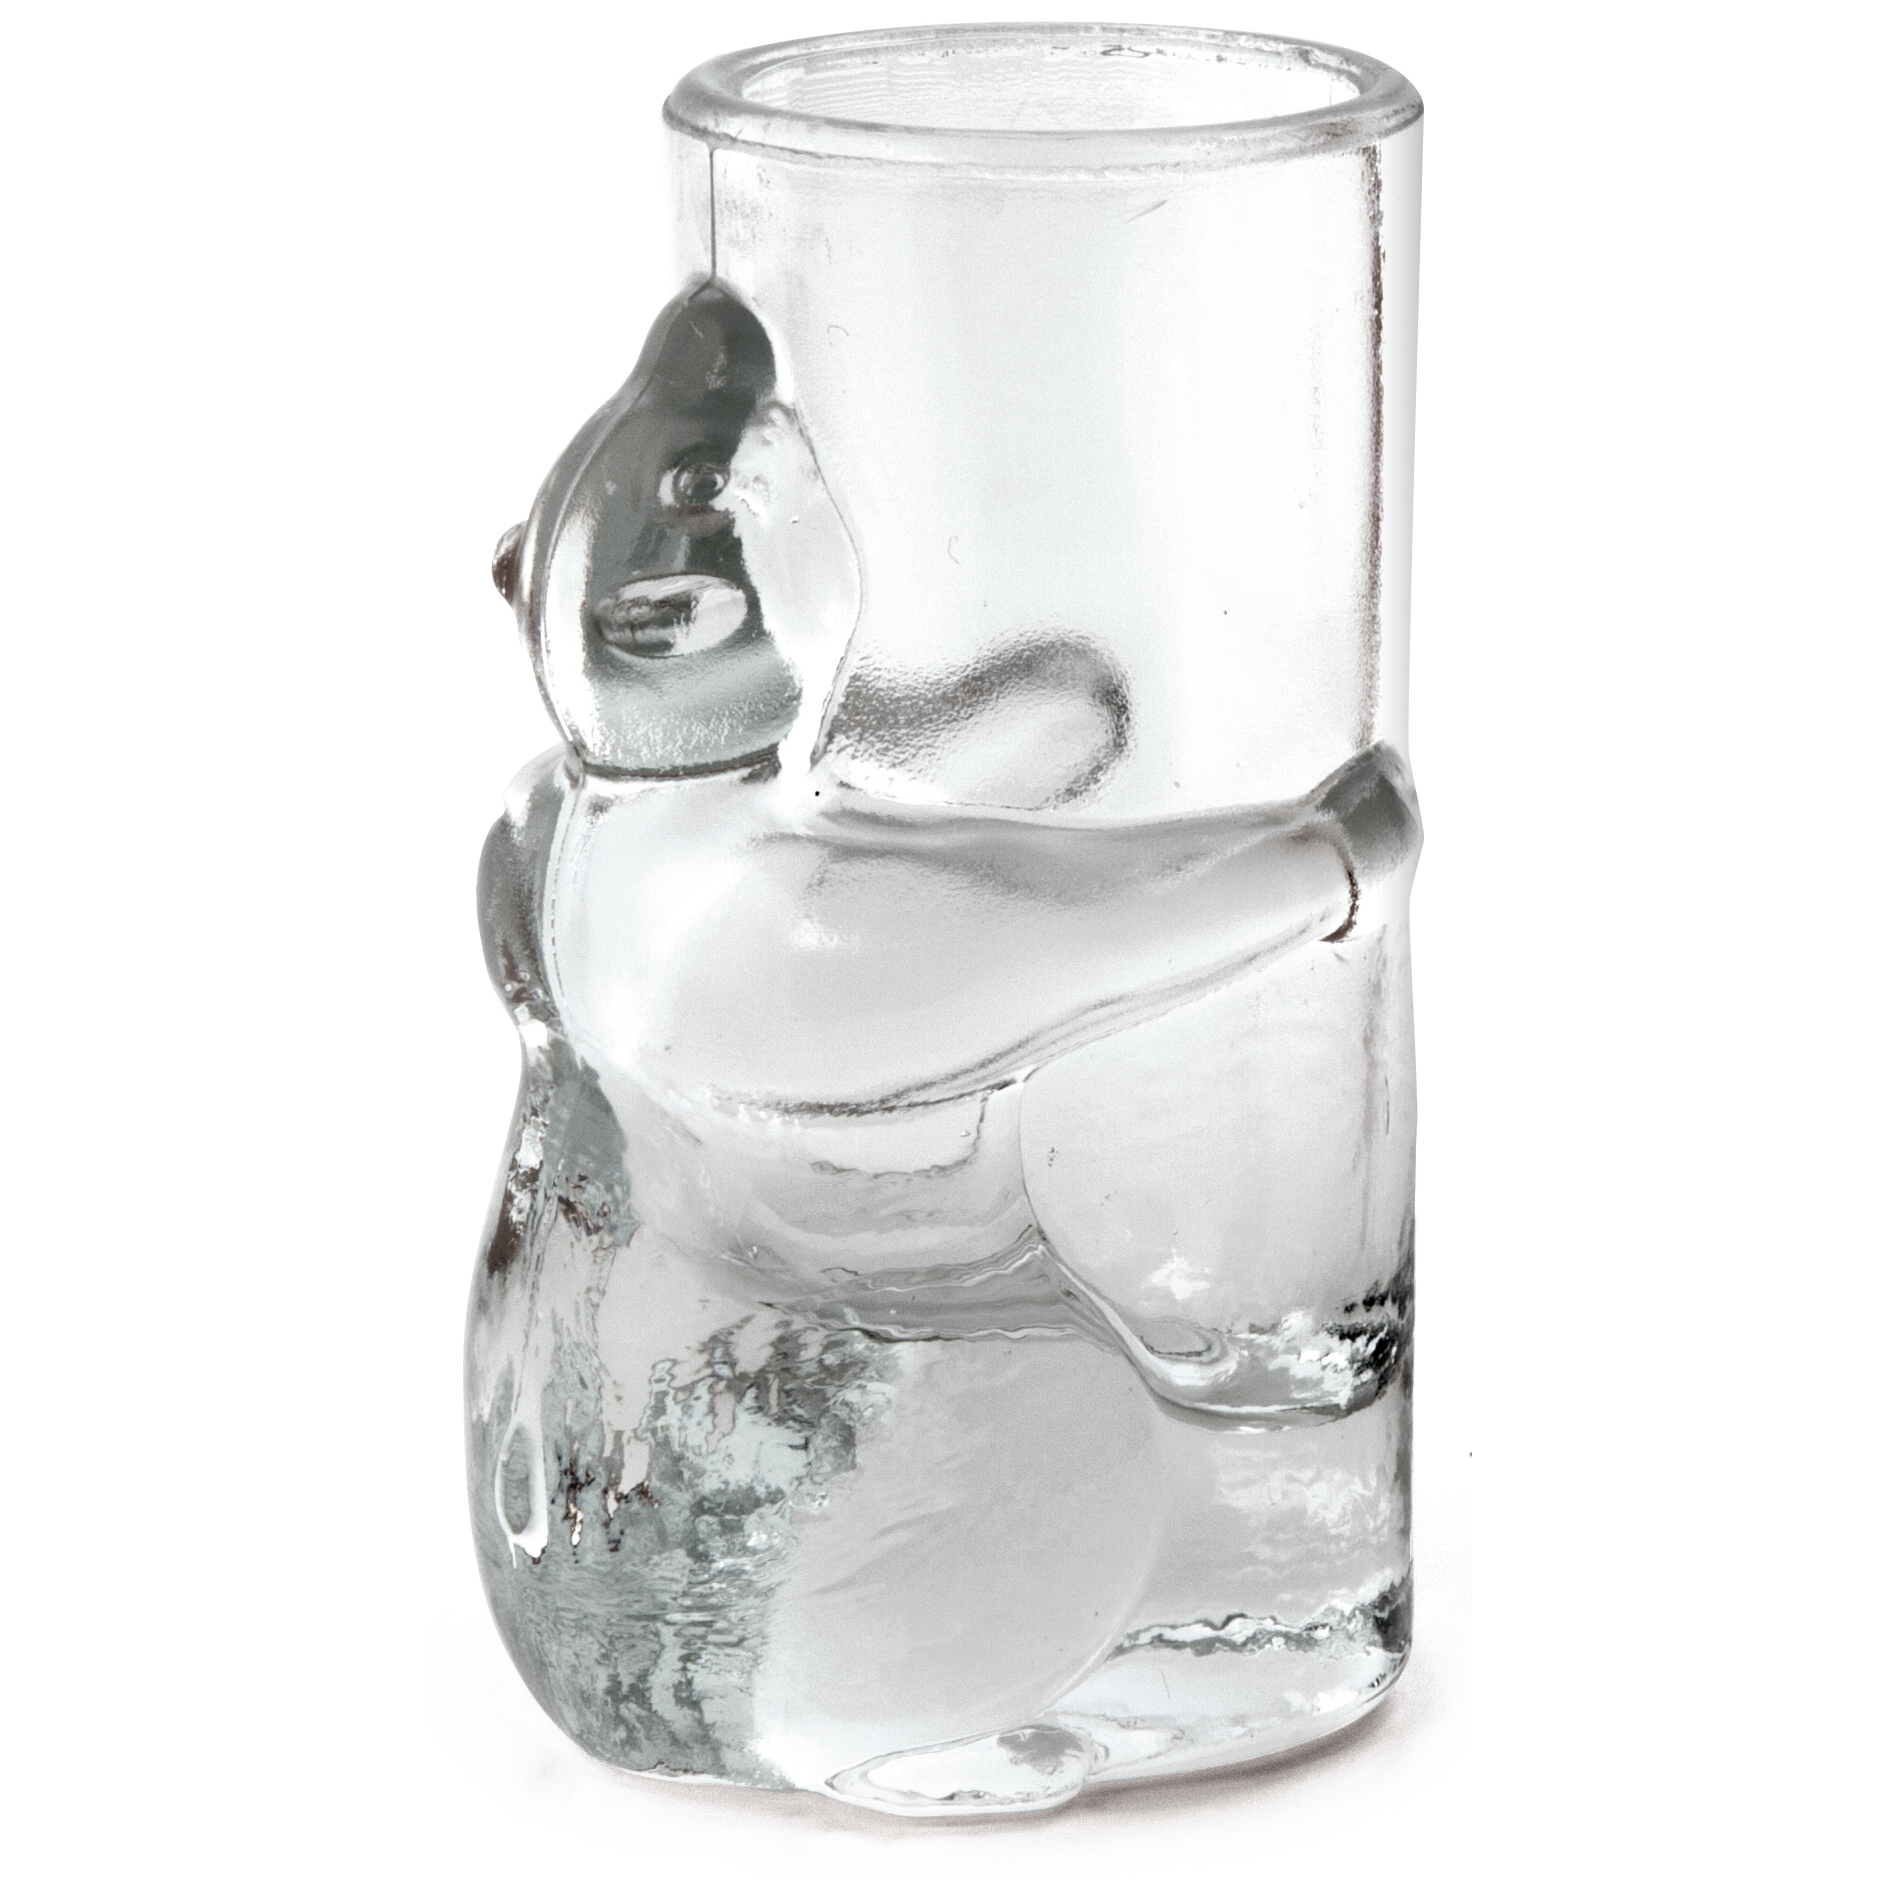 Kikkerland Bear 1.5 Ounce Shot Glass, Set of 4